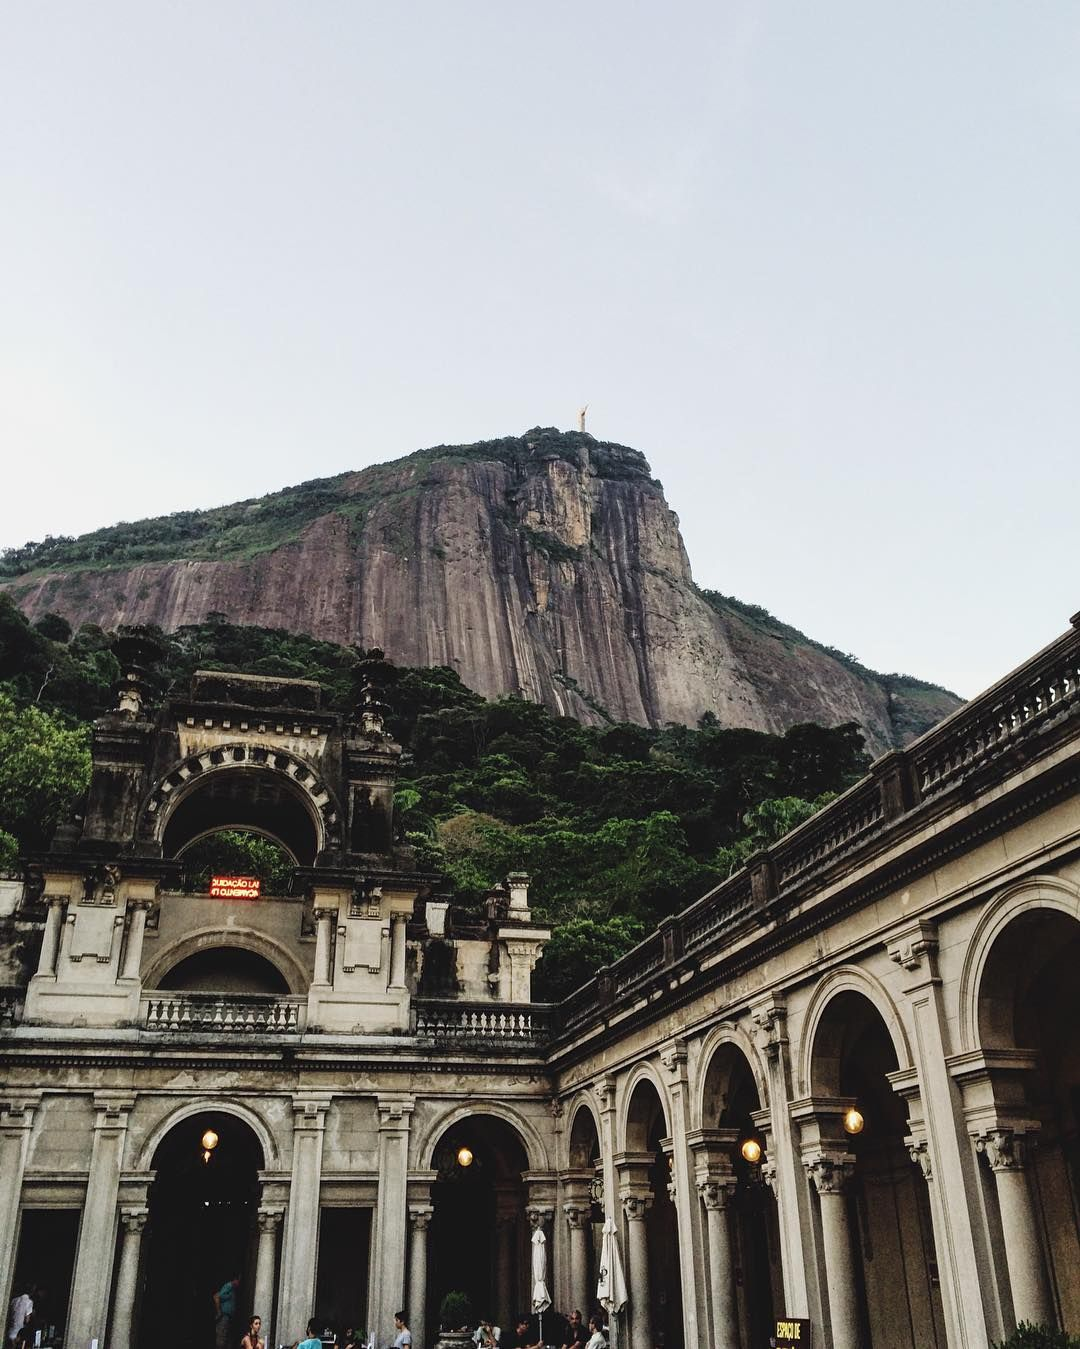 Ver esta foto do Instagram de @juliacpeixoto • 352 curtidas